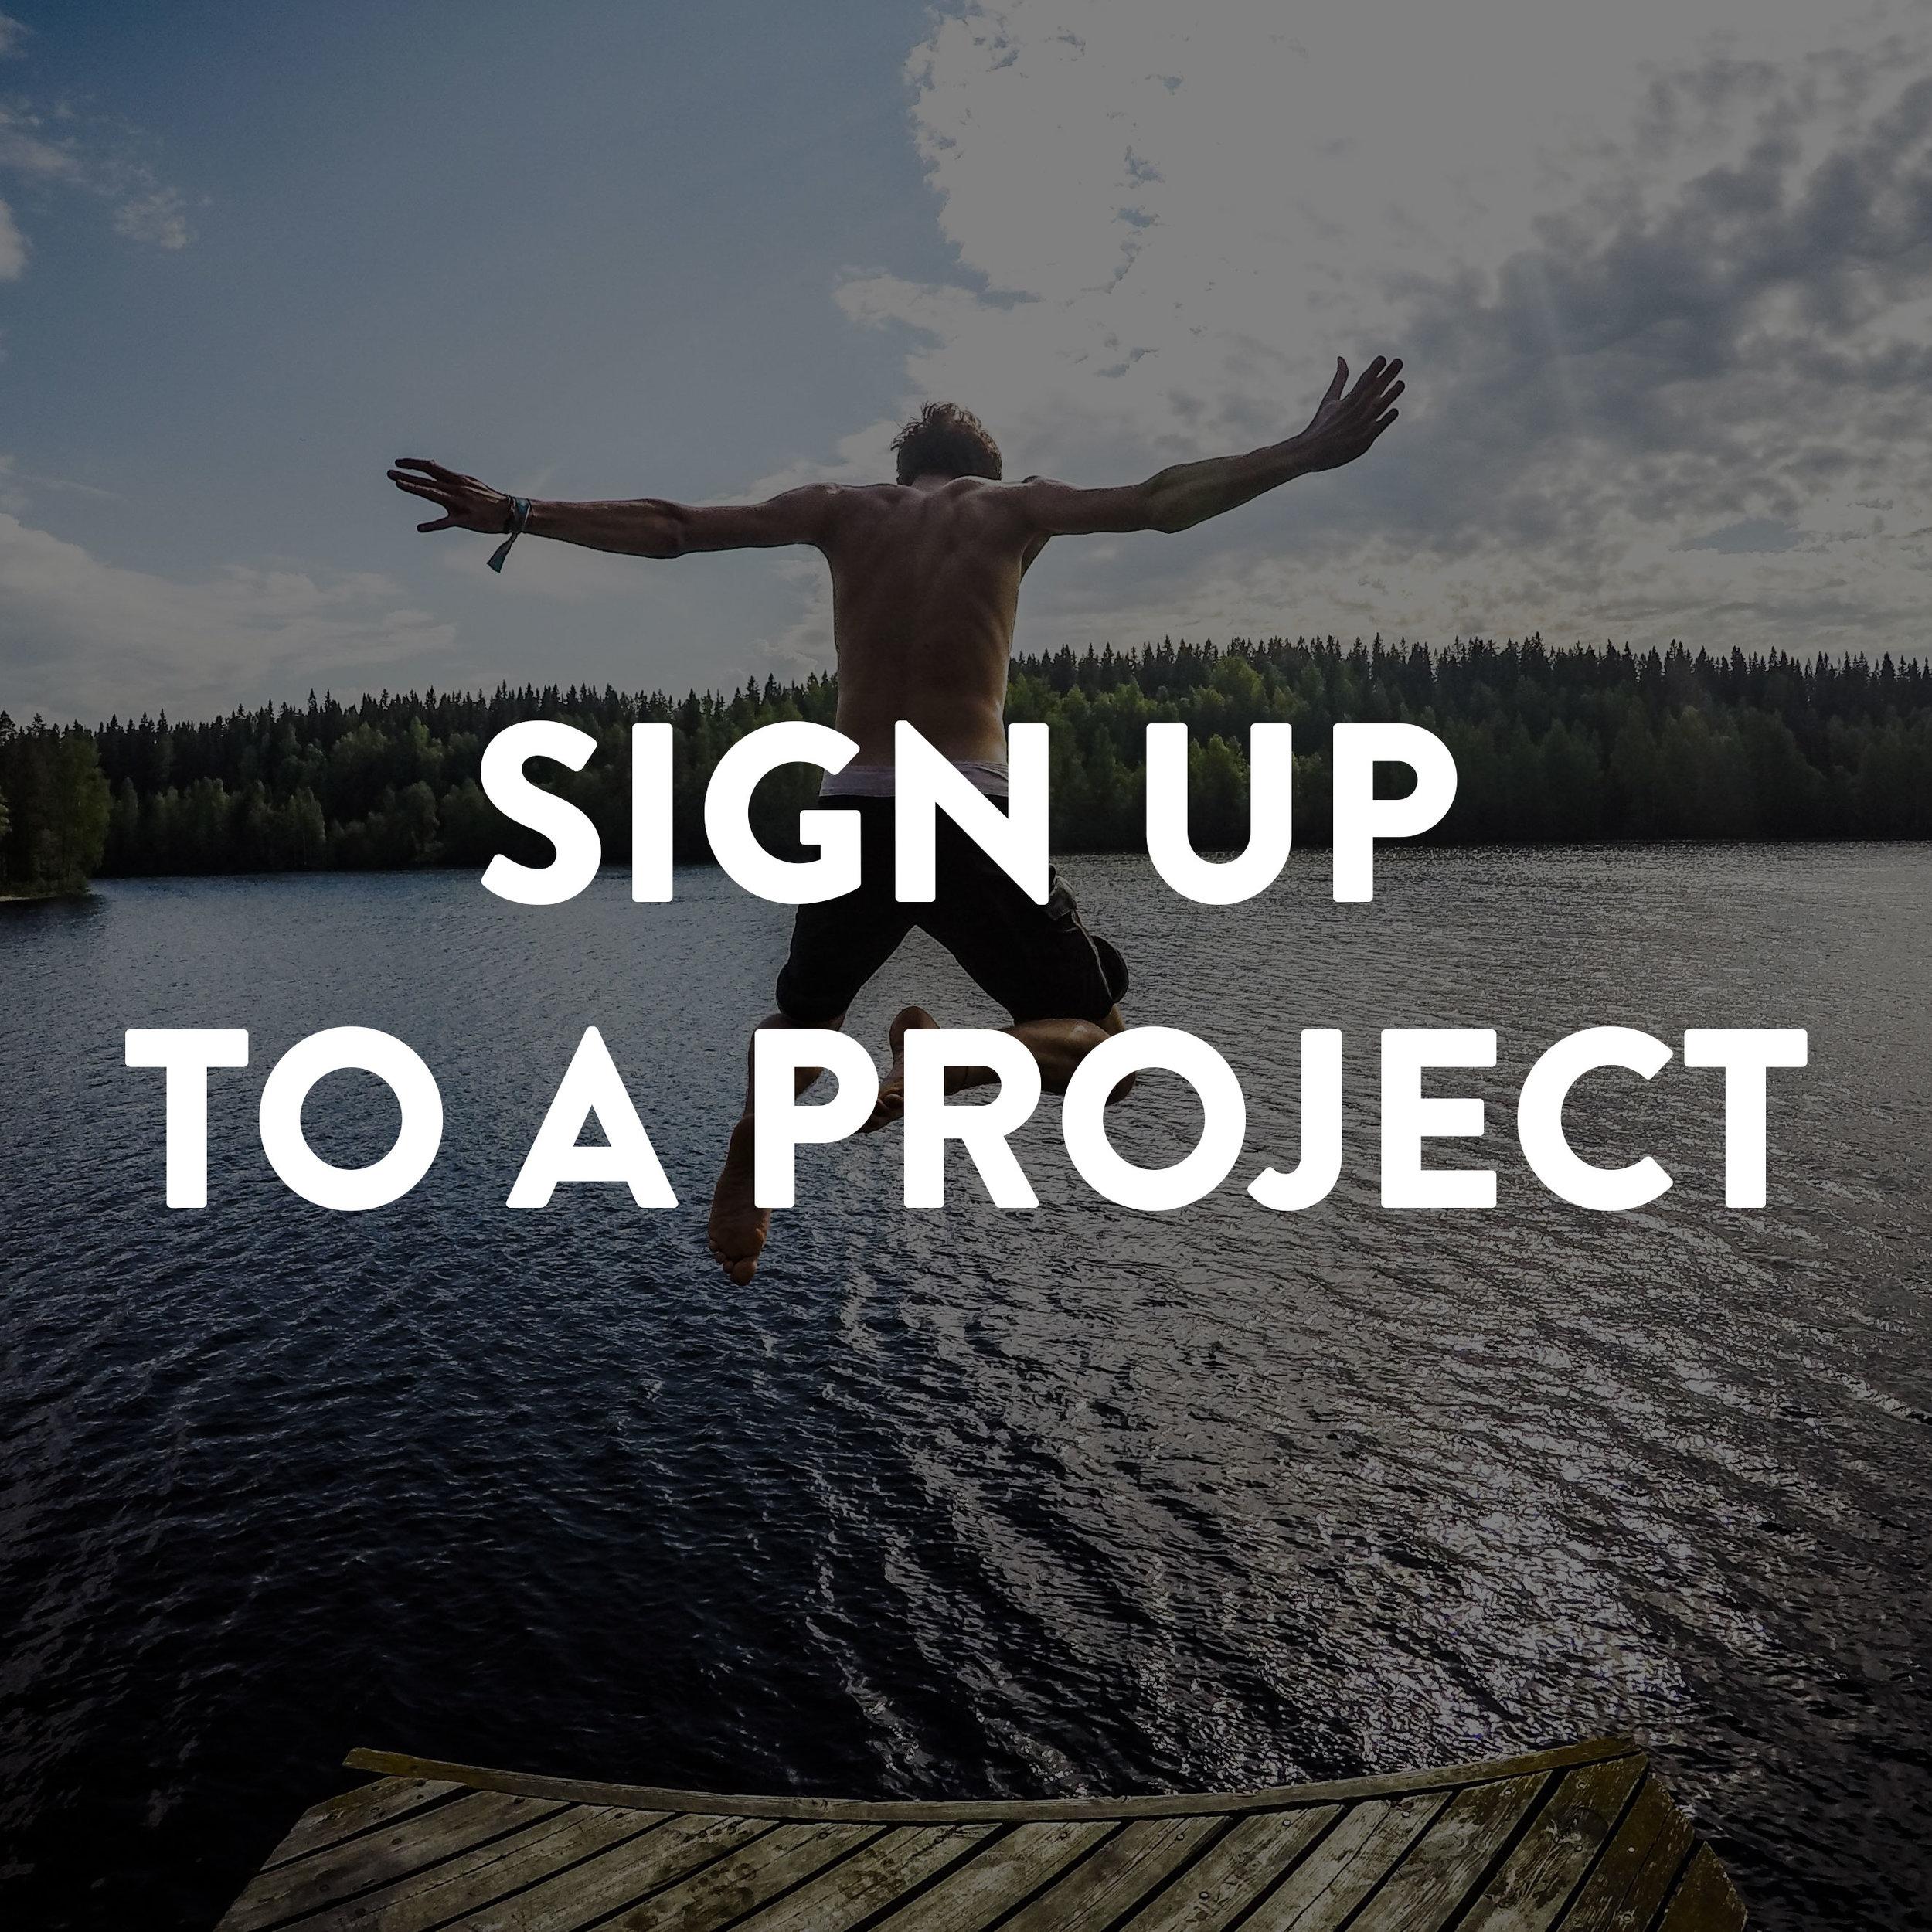 SignUpToAProject.jpg